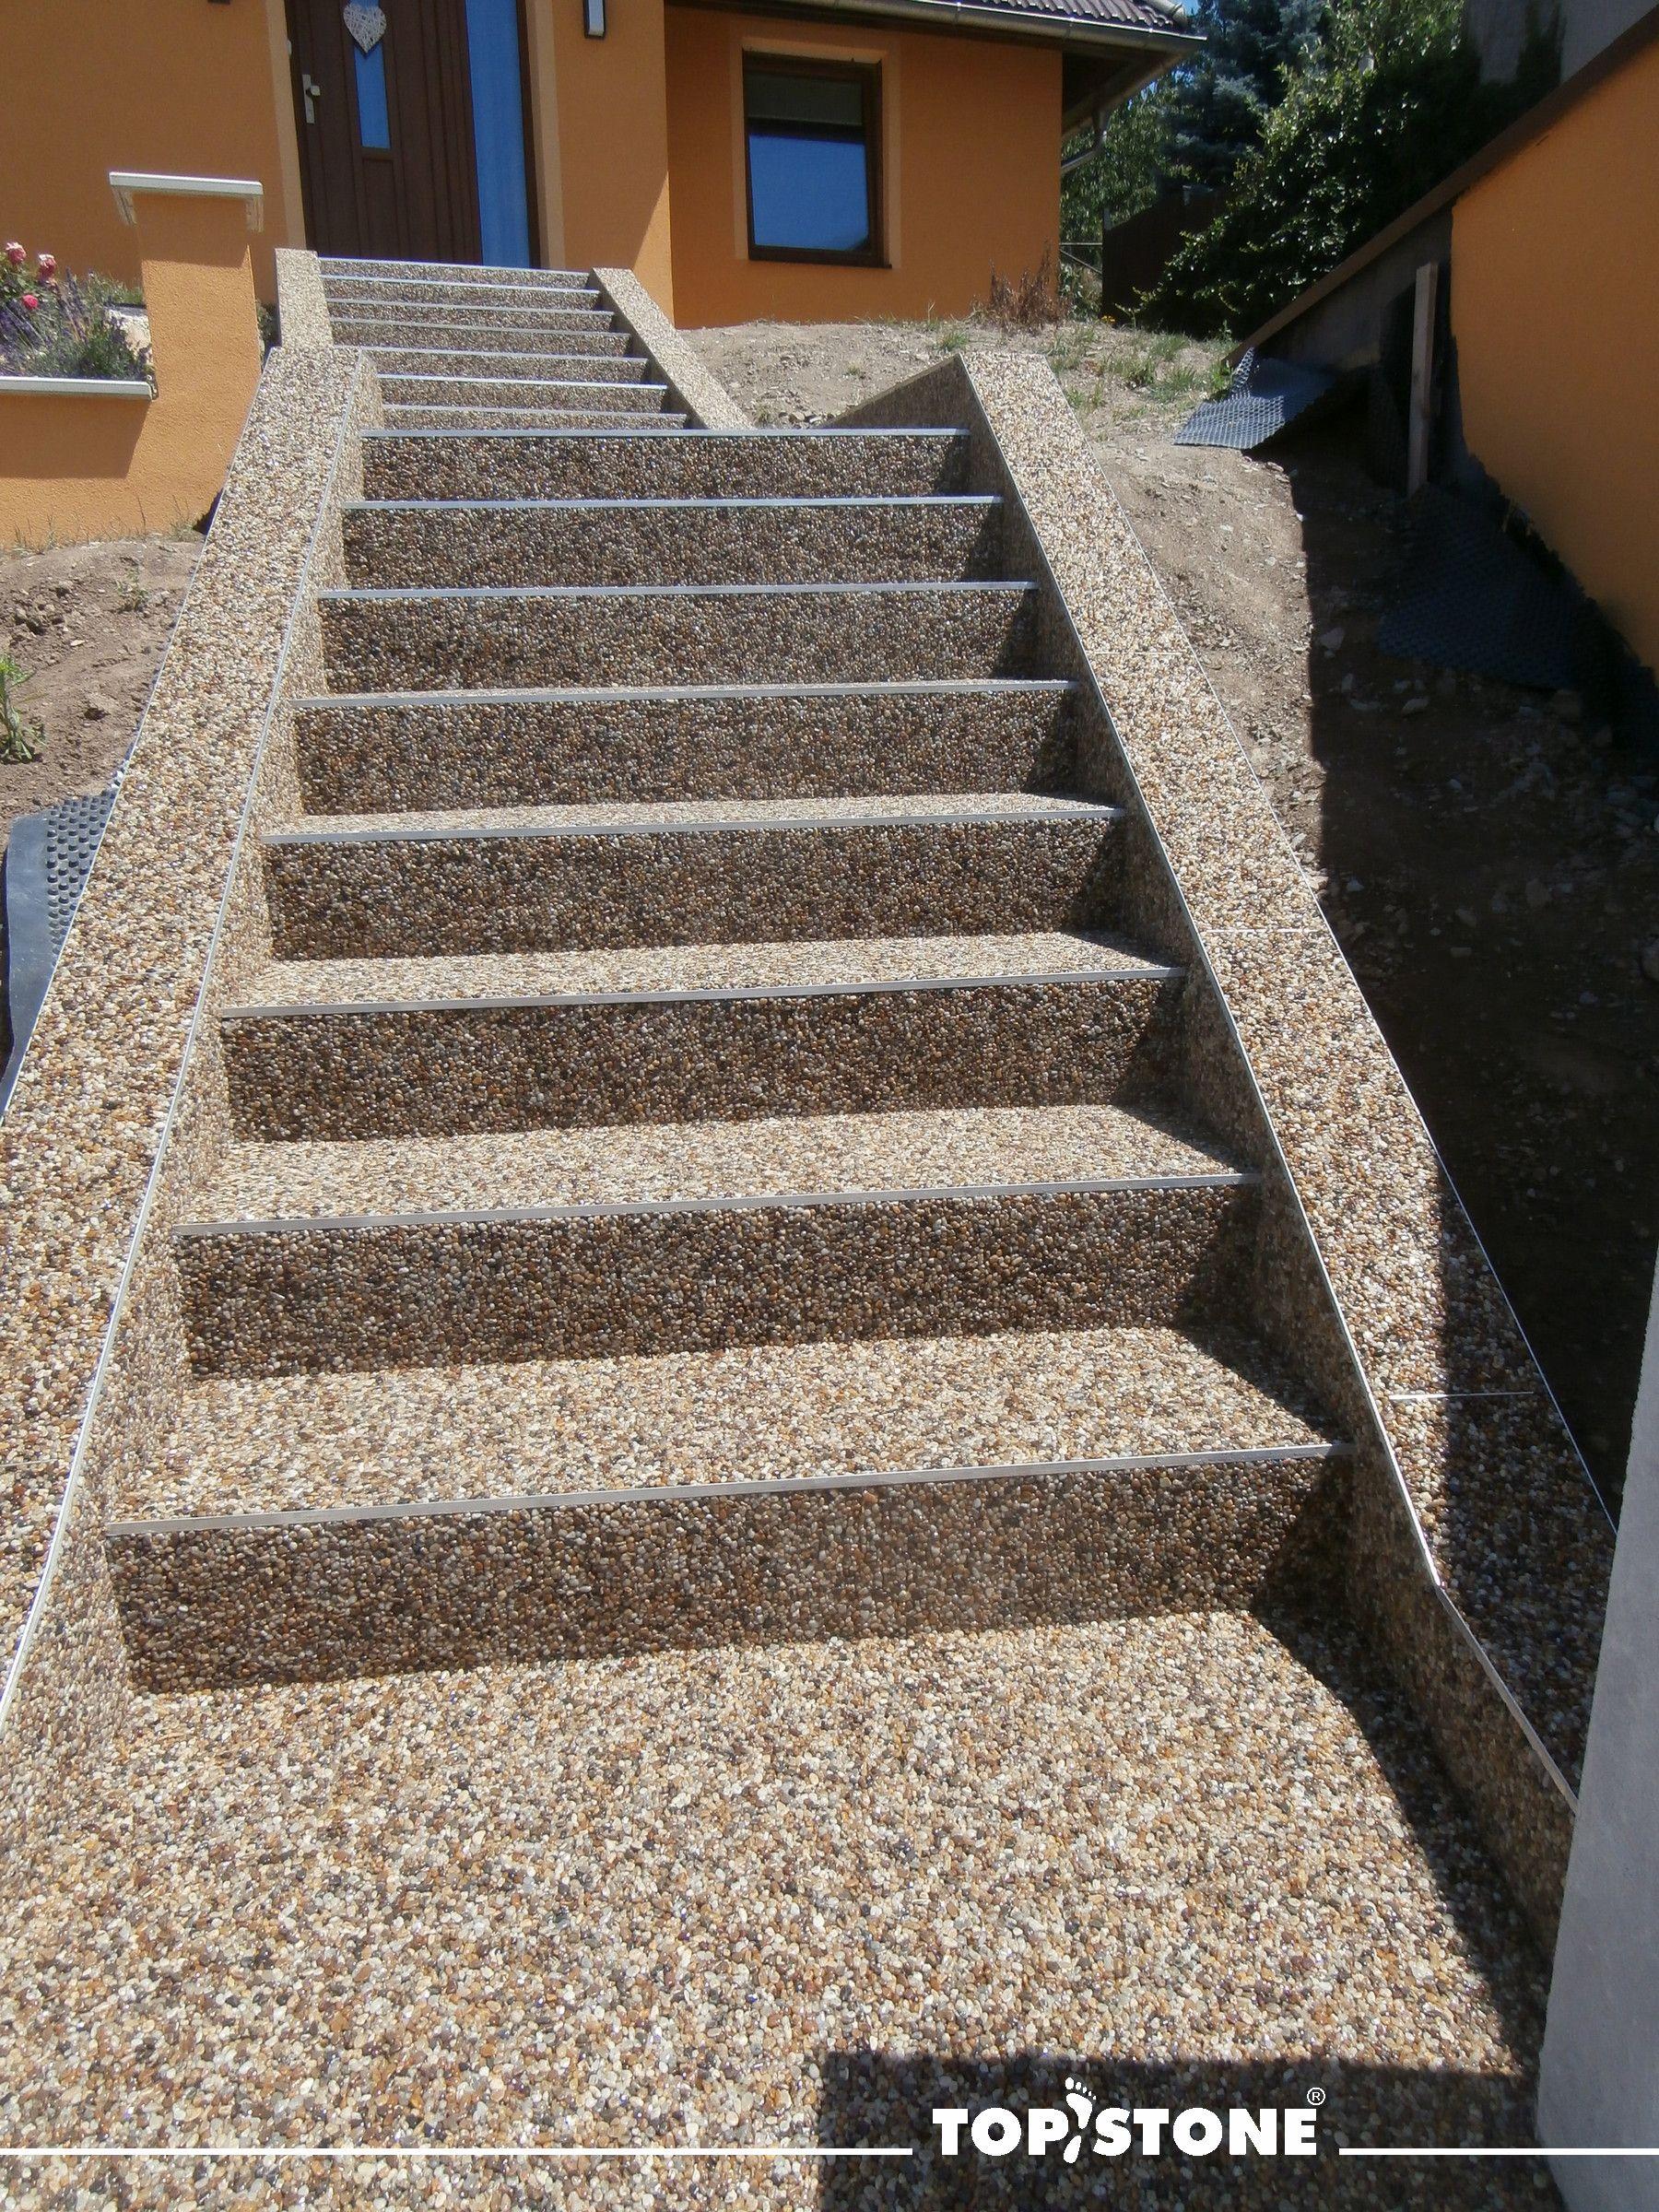 Schody Do Raje Si Nechali Zrealizovat Nasi Zakaznici Na Olomoucku Z Ricniho Kaminku Kreta Prejeme S Concrete Stairs Concrete Steps Stone Walls Interior